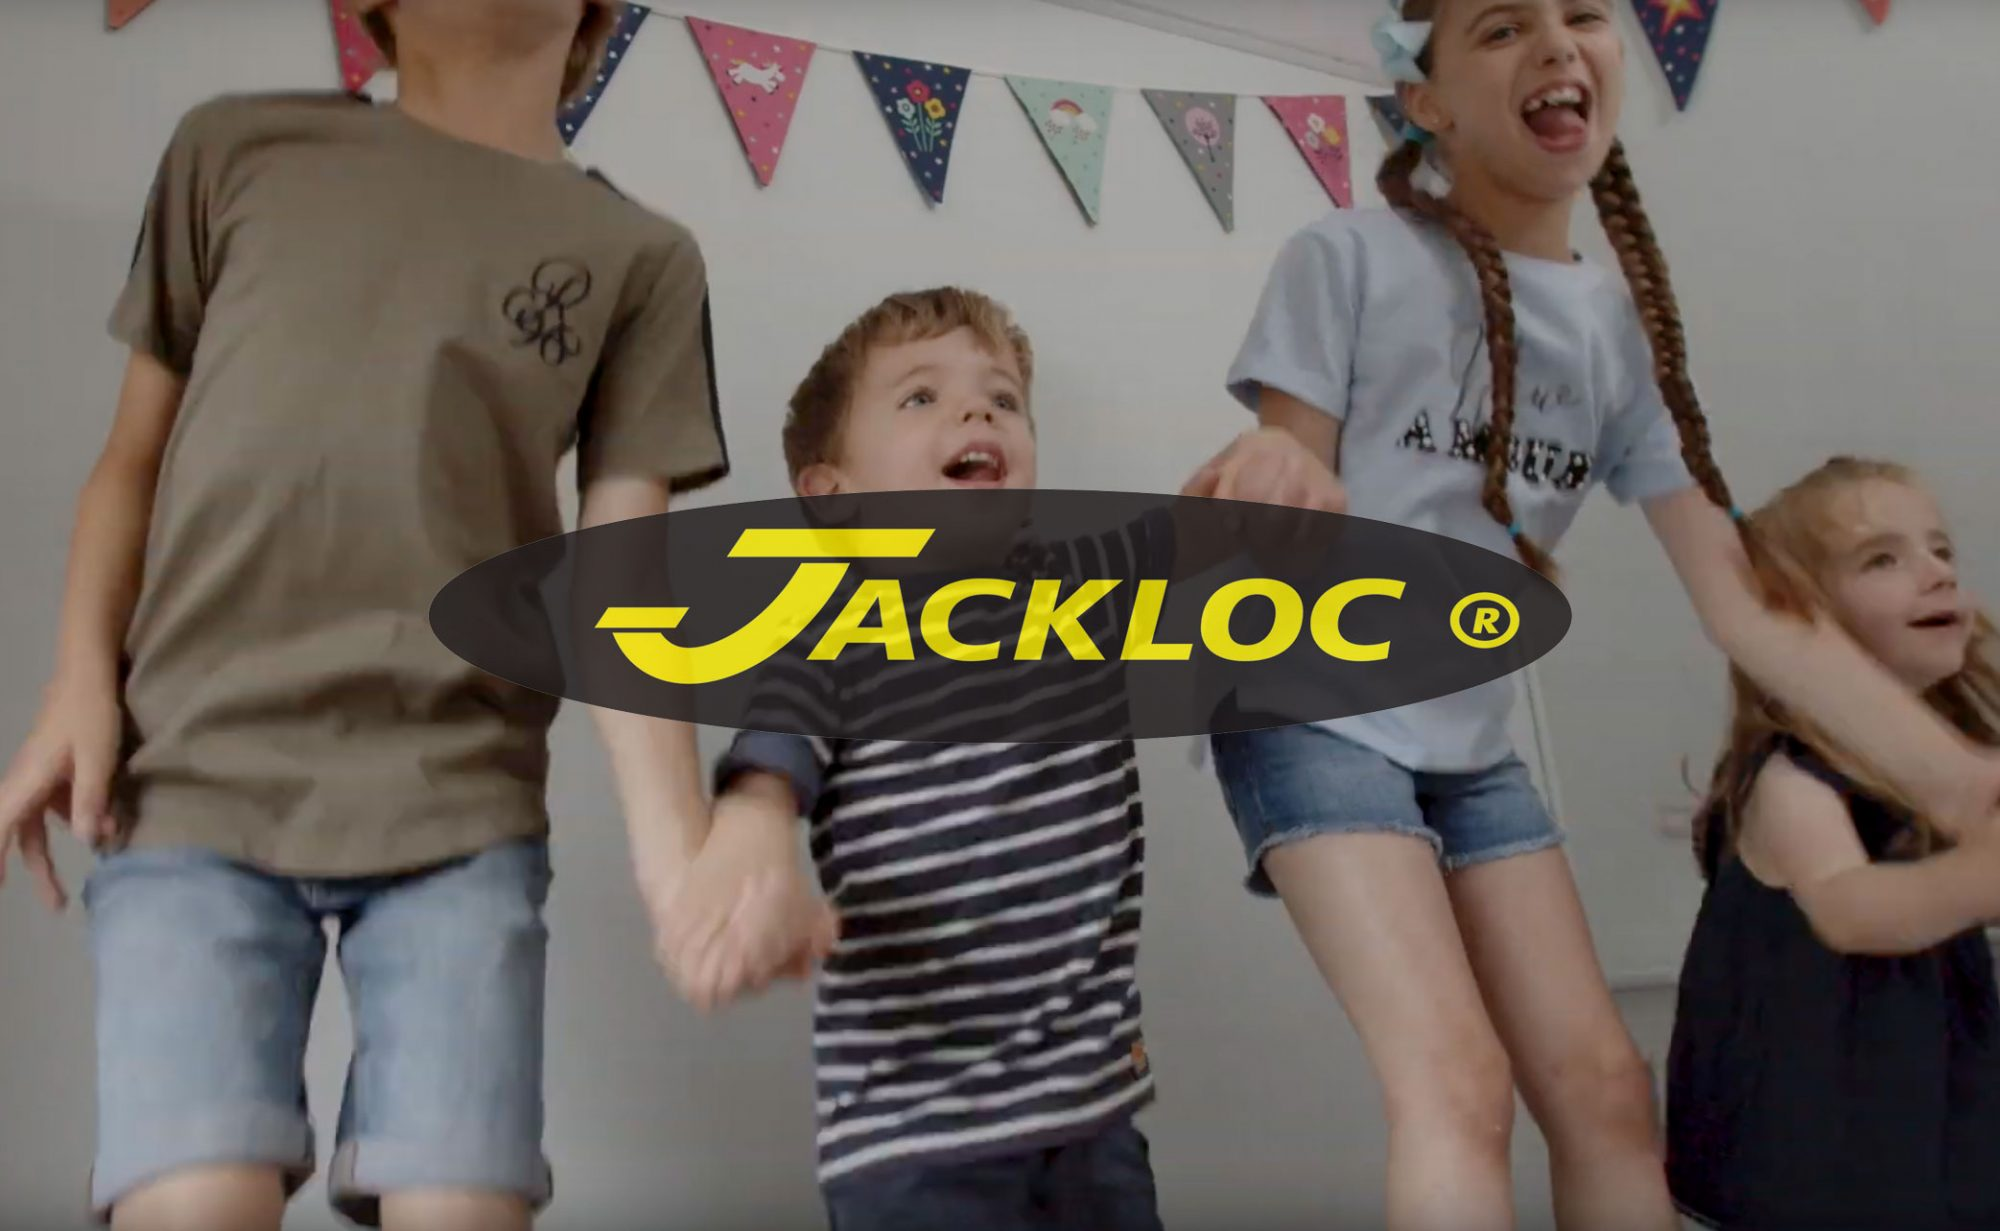 Jackloc children video